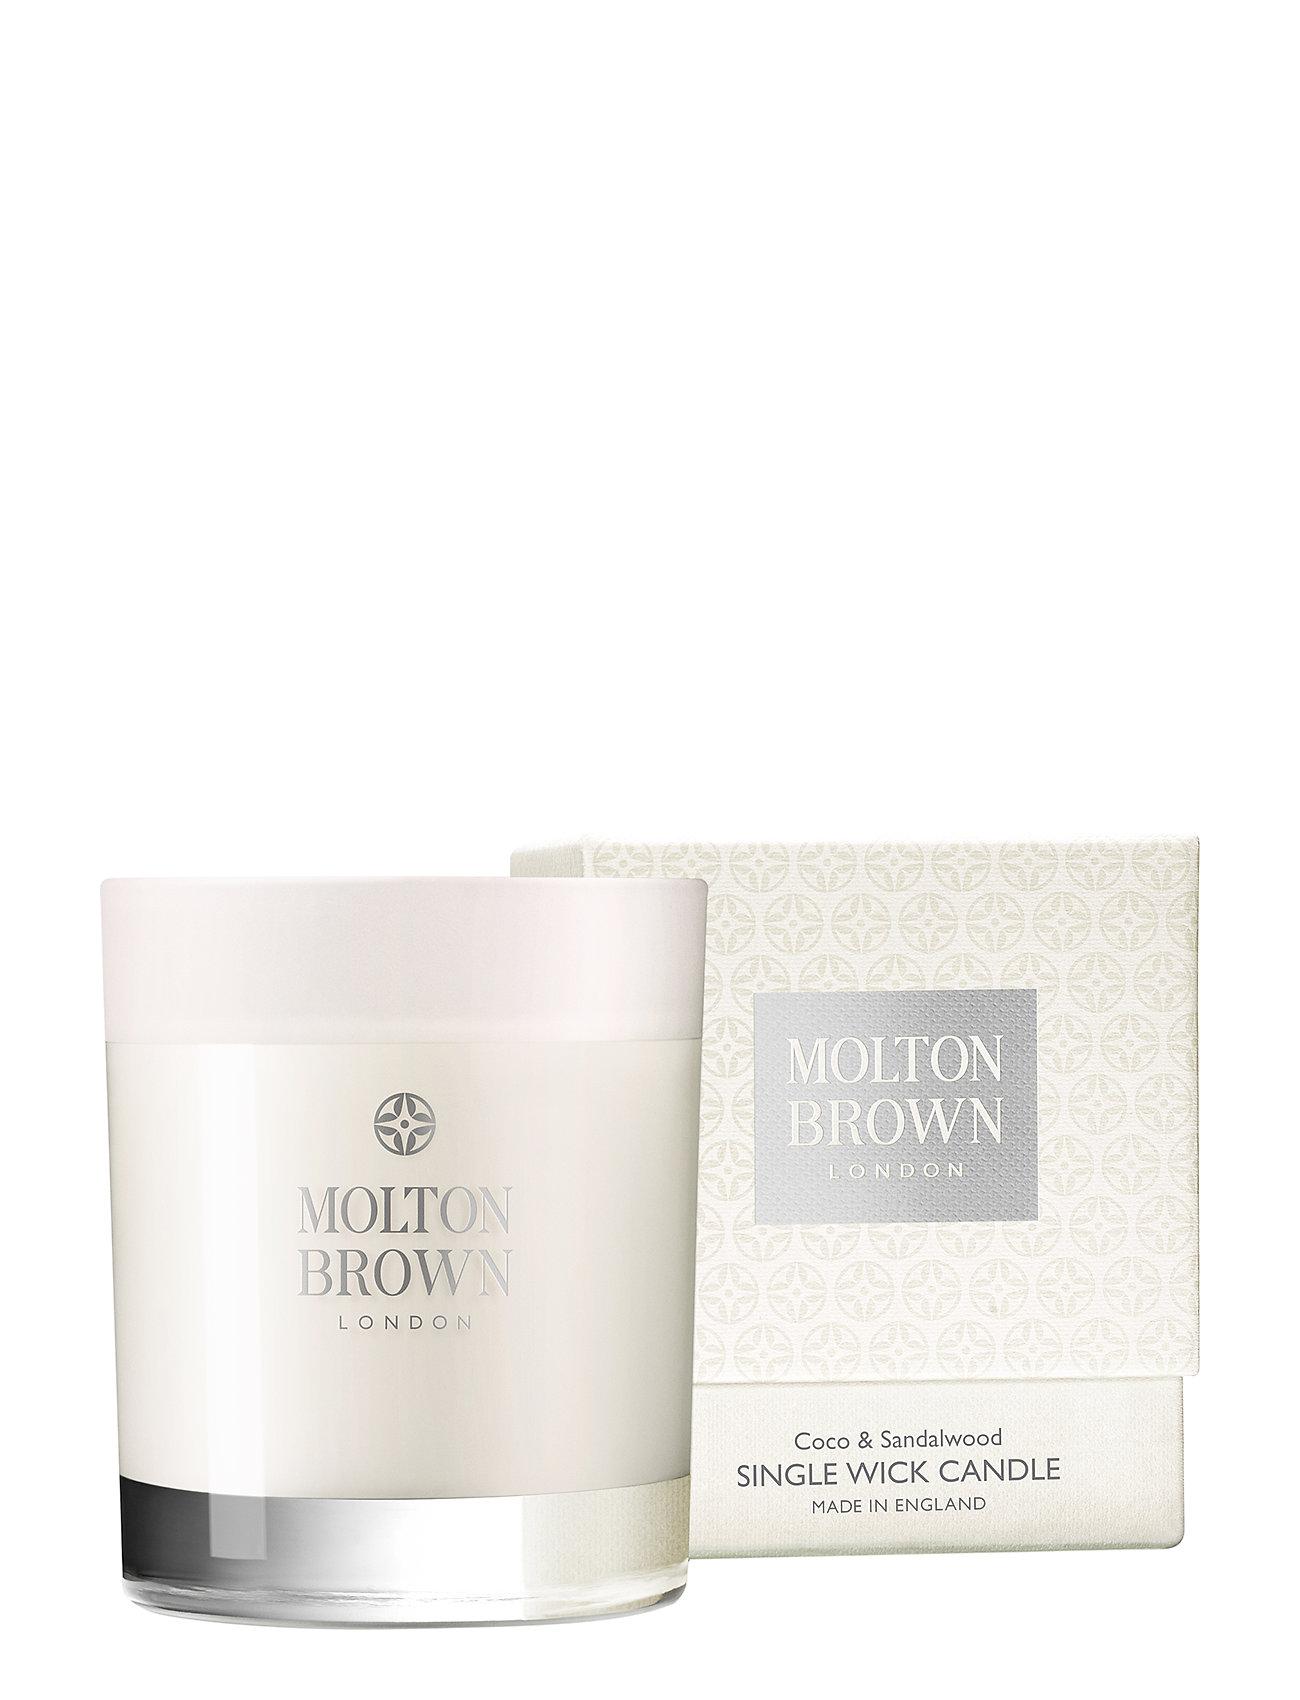 Molton Brown Coco & Sandalwood Single Wick Candle - NO COLOUR